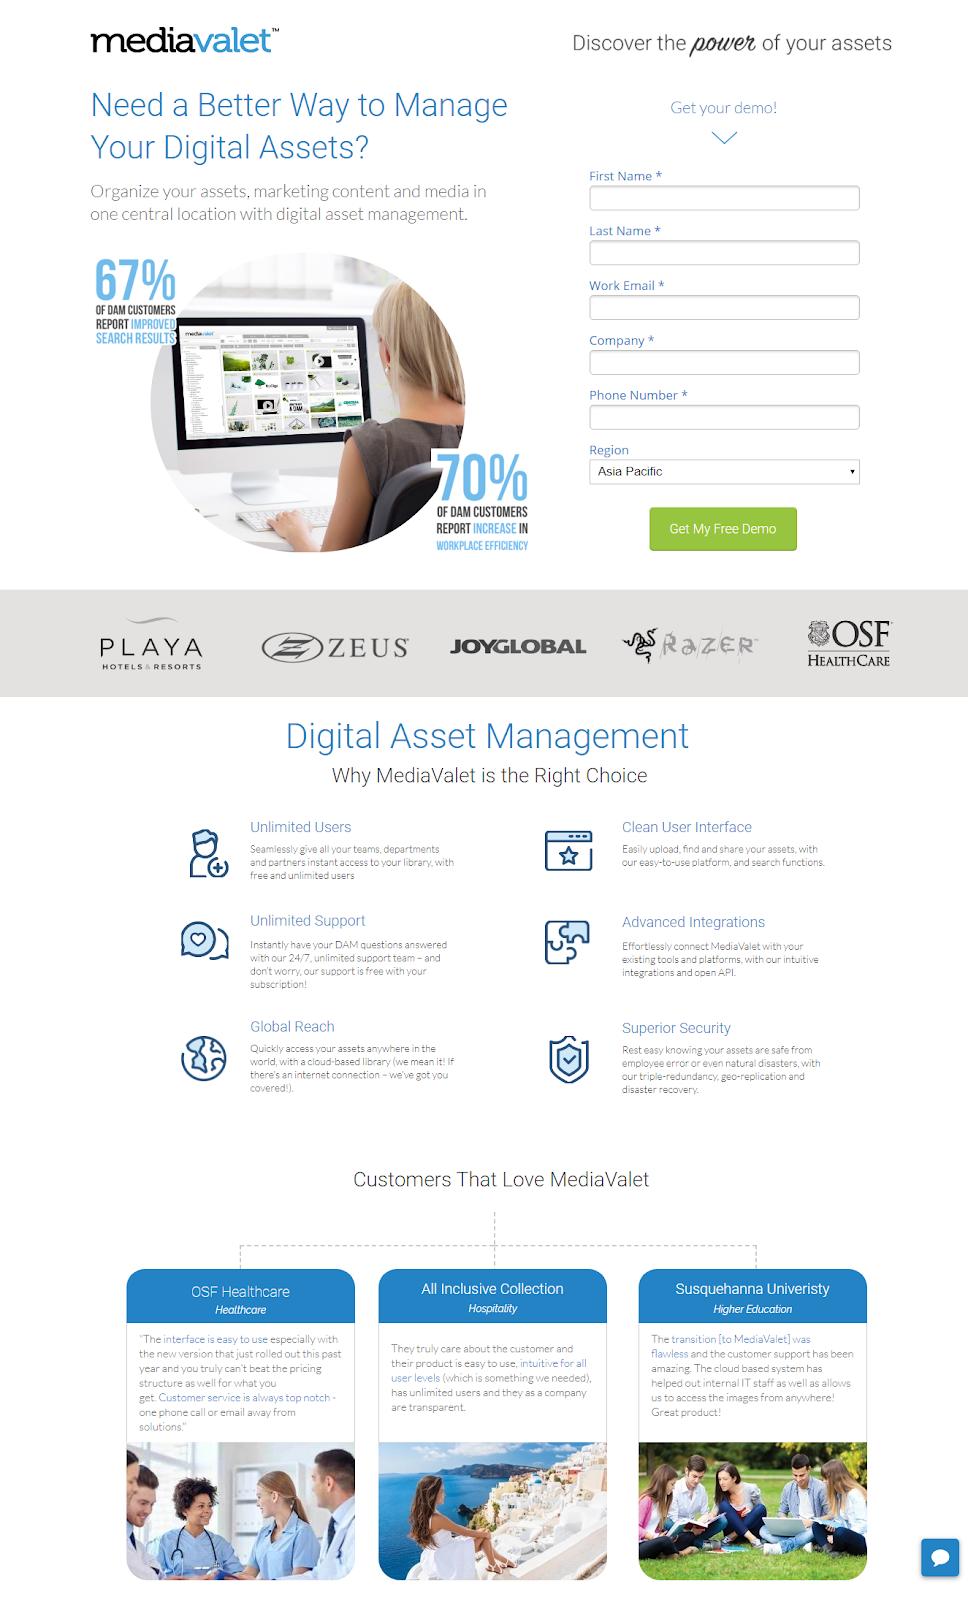 mediavalet lead generation page